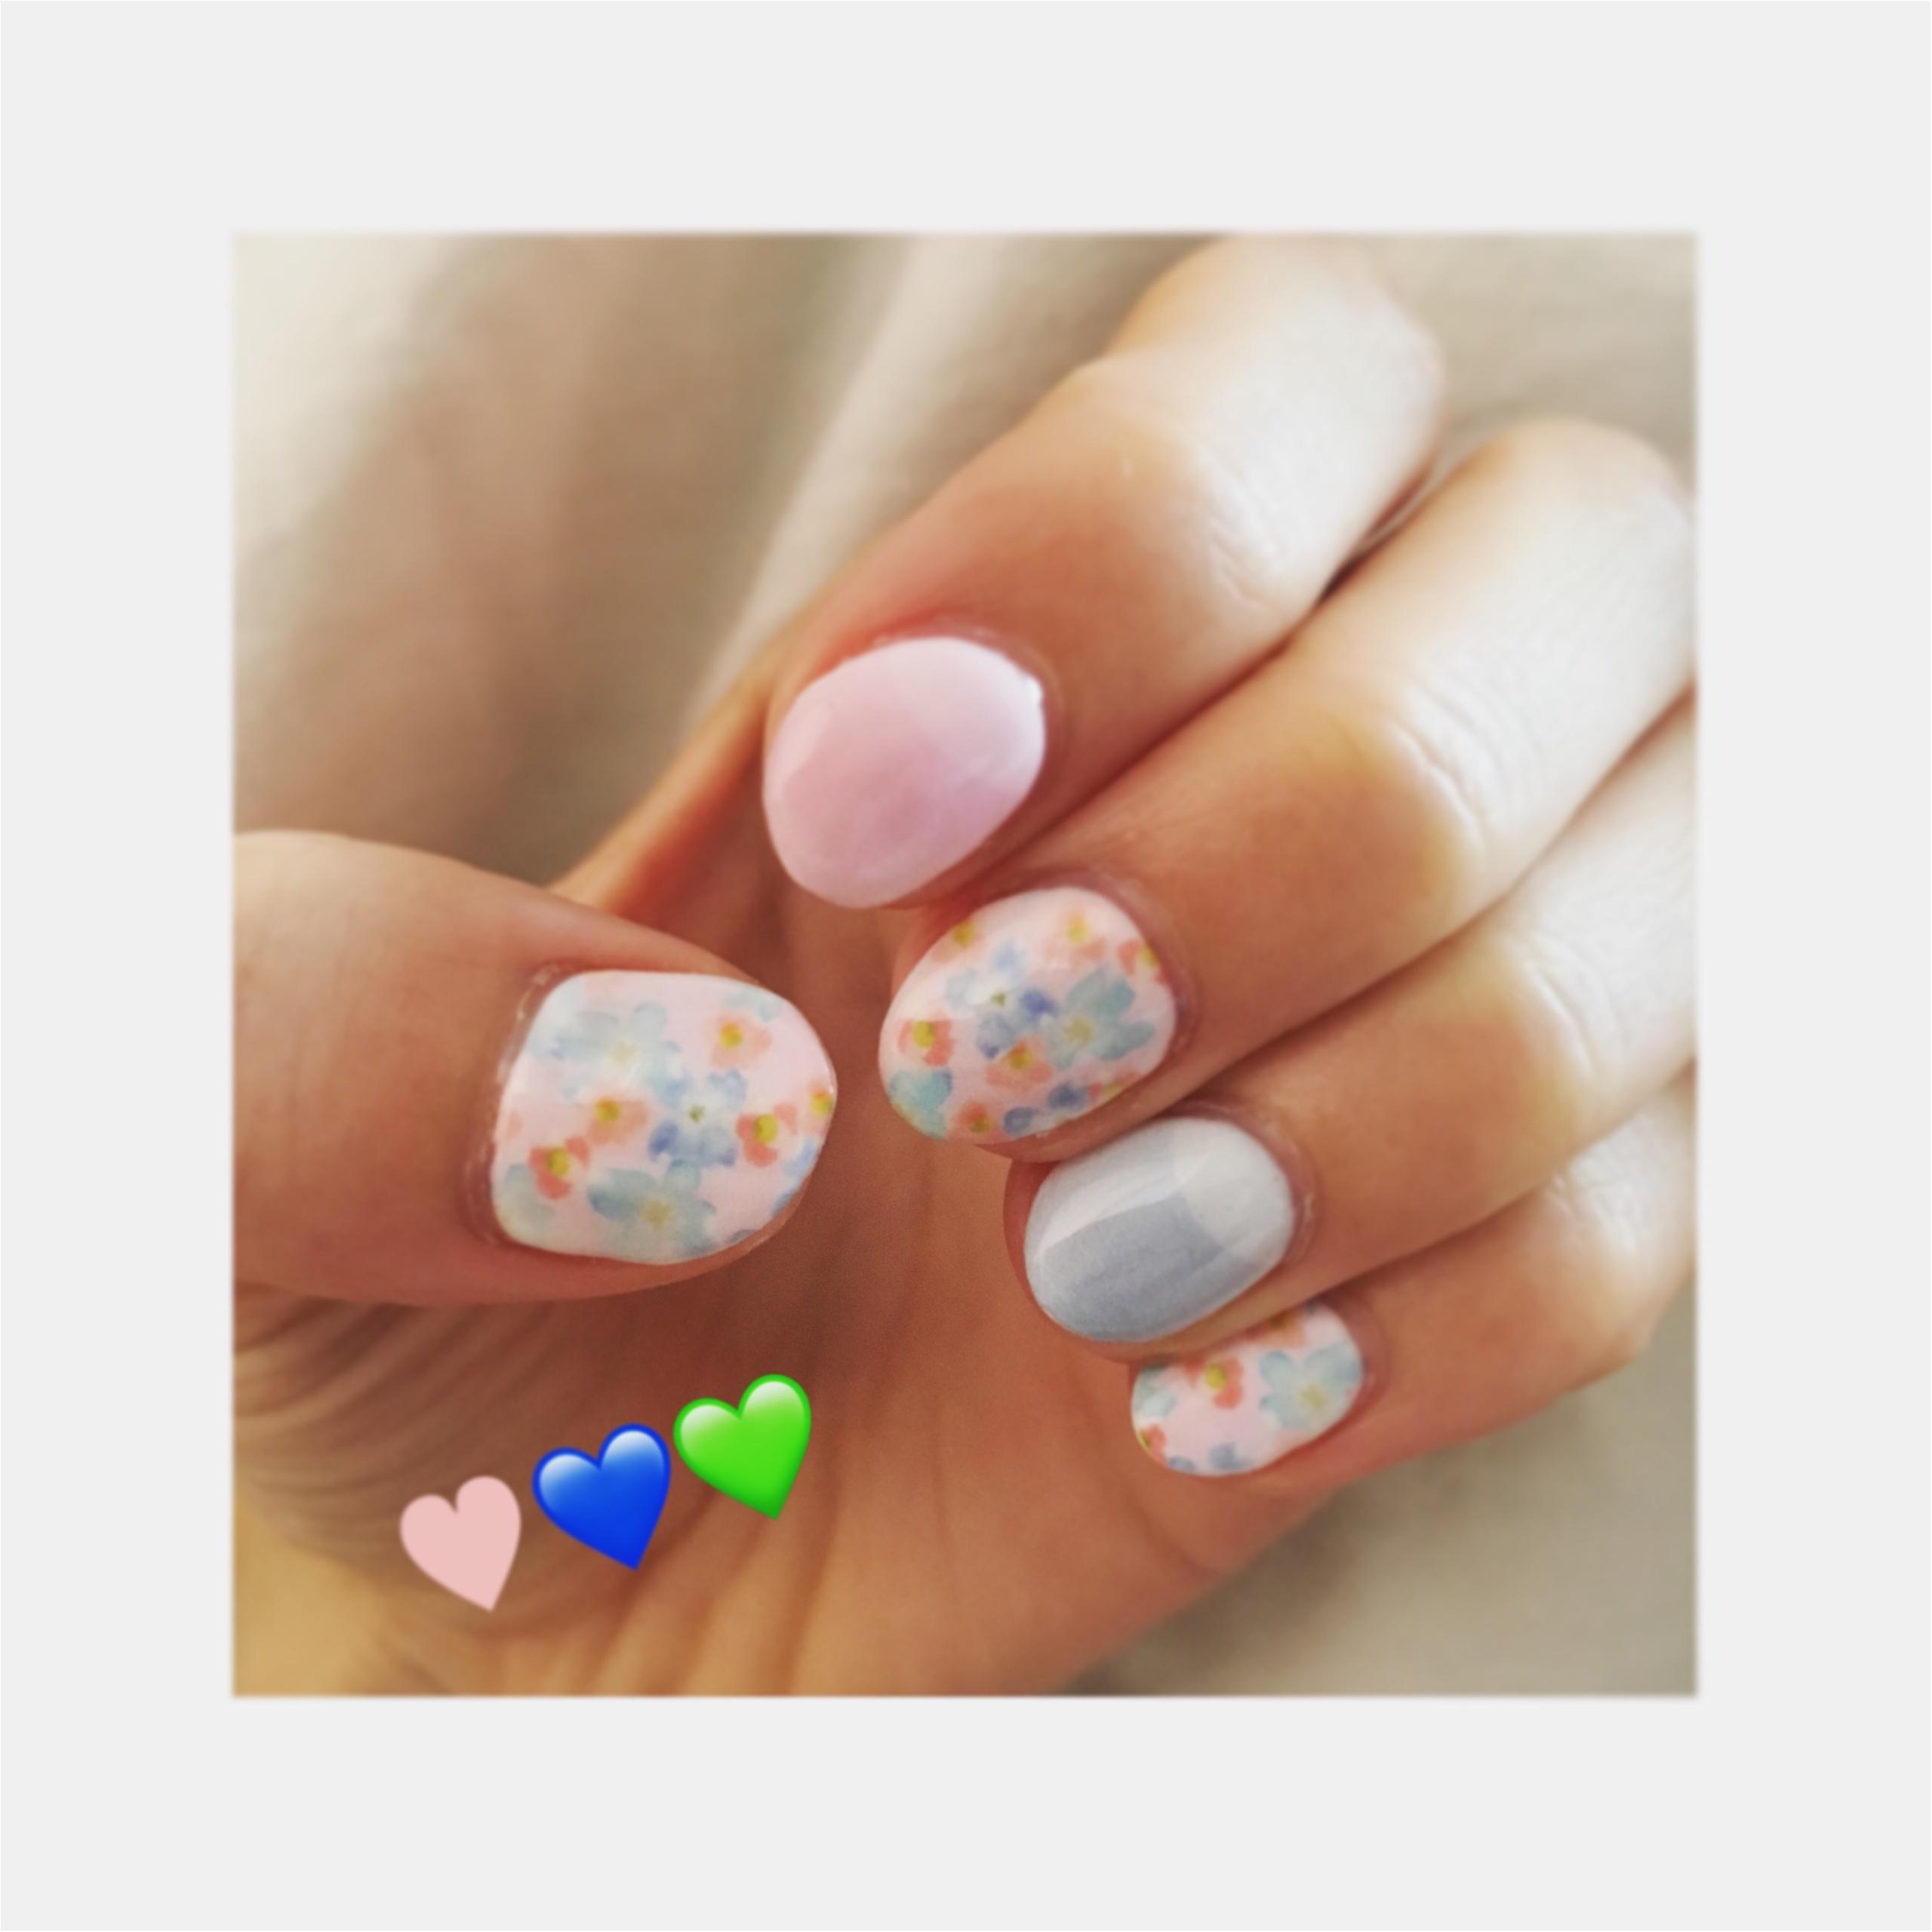 【New Nail★】フラワー柄×パステルで女の子らしさ全開に♡_1